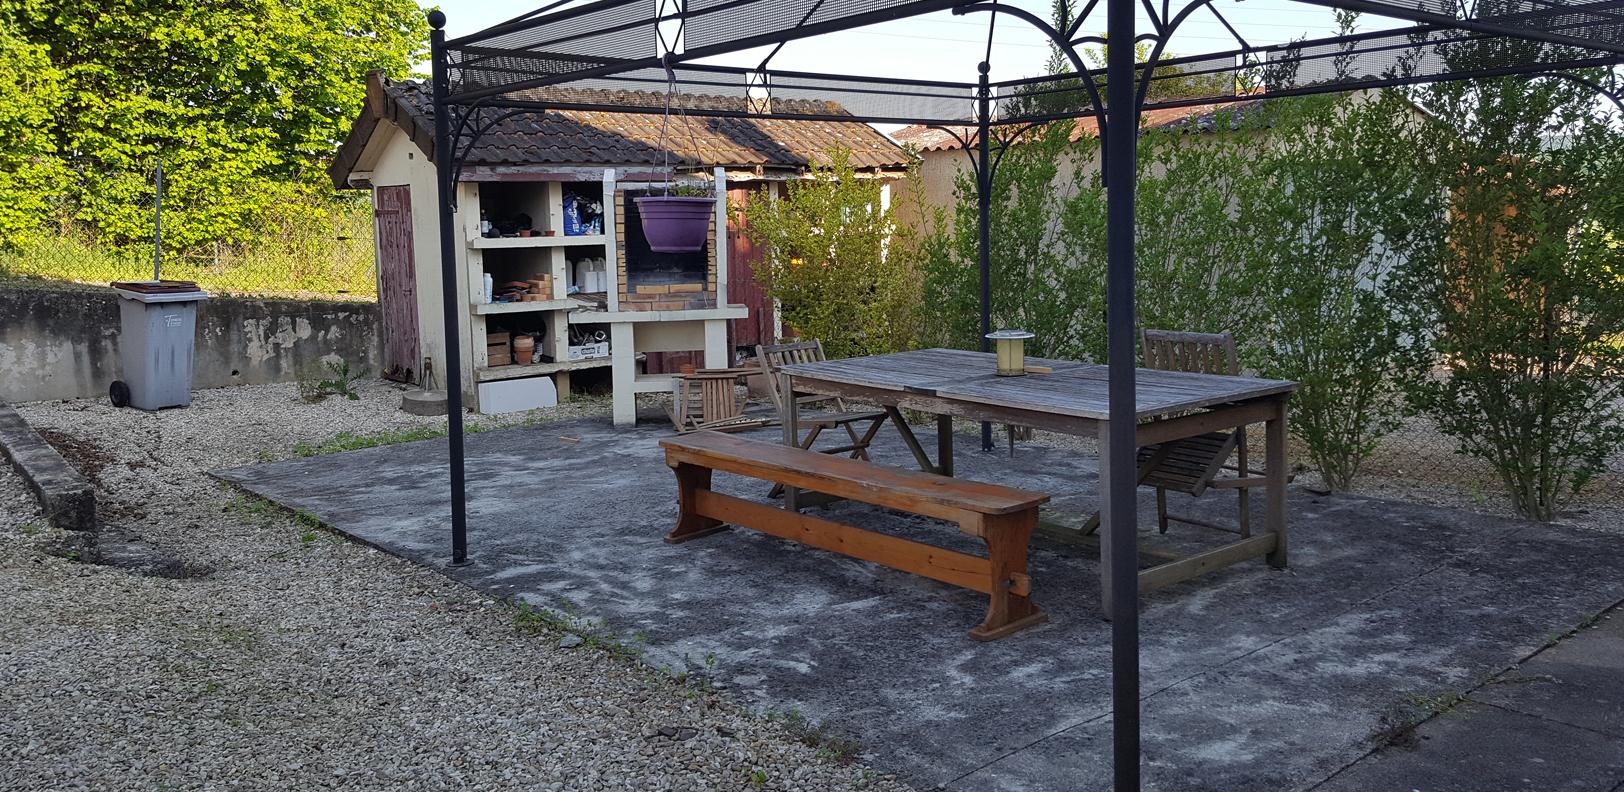 comment relooker une terrasse